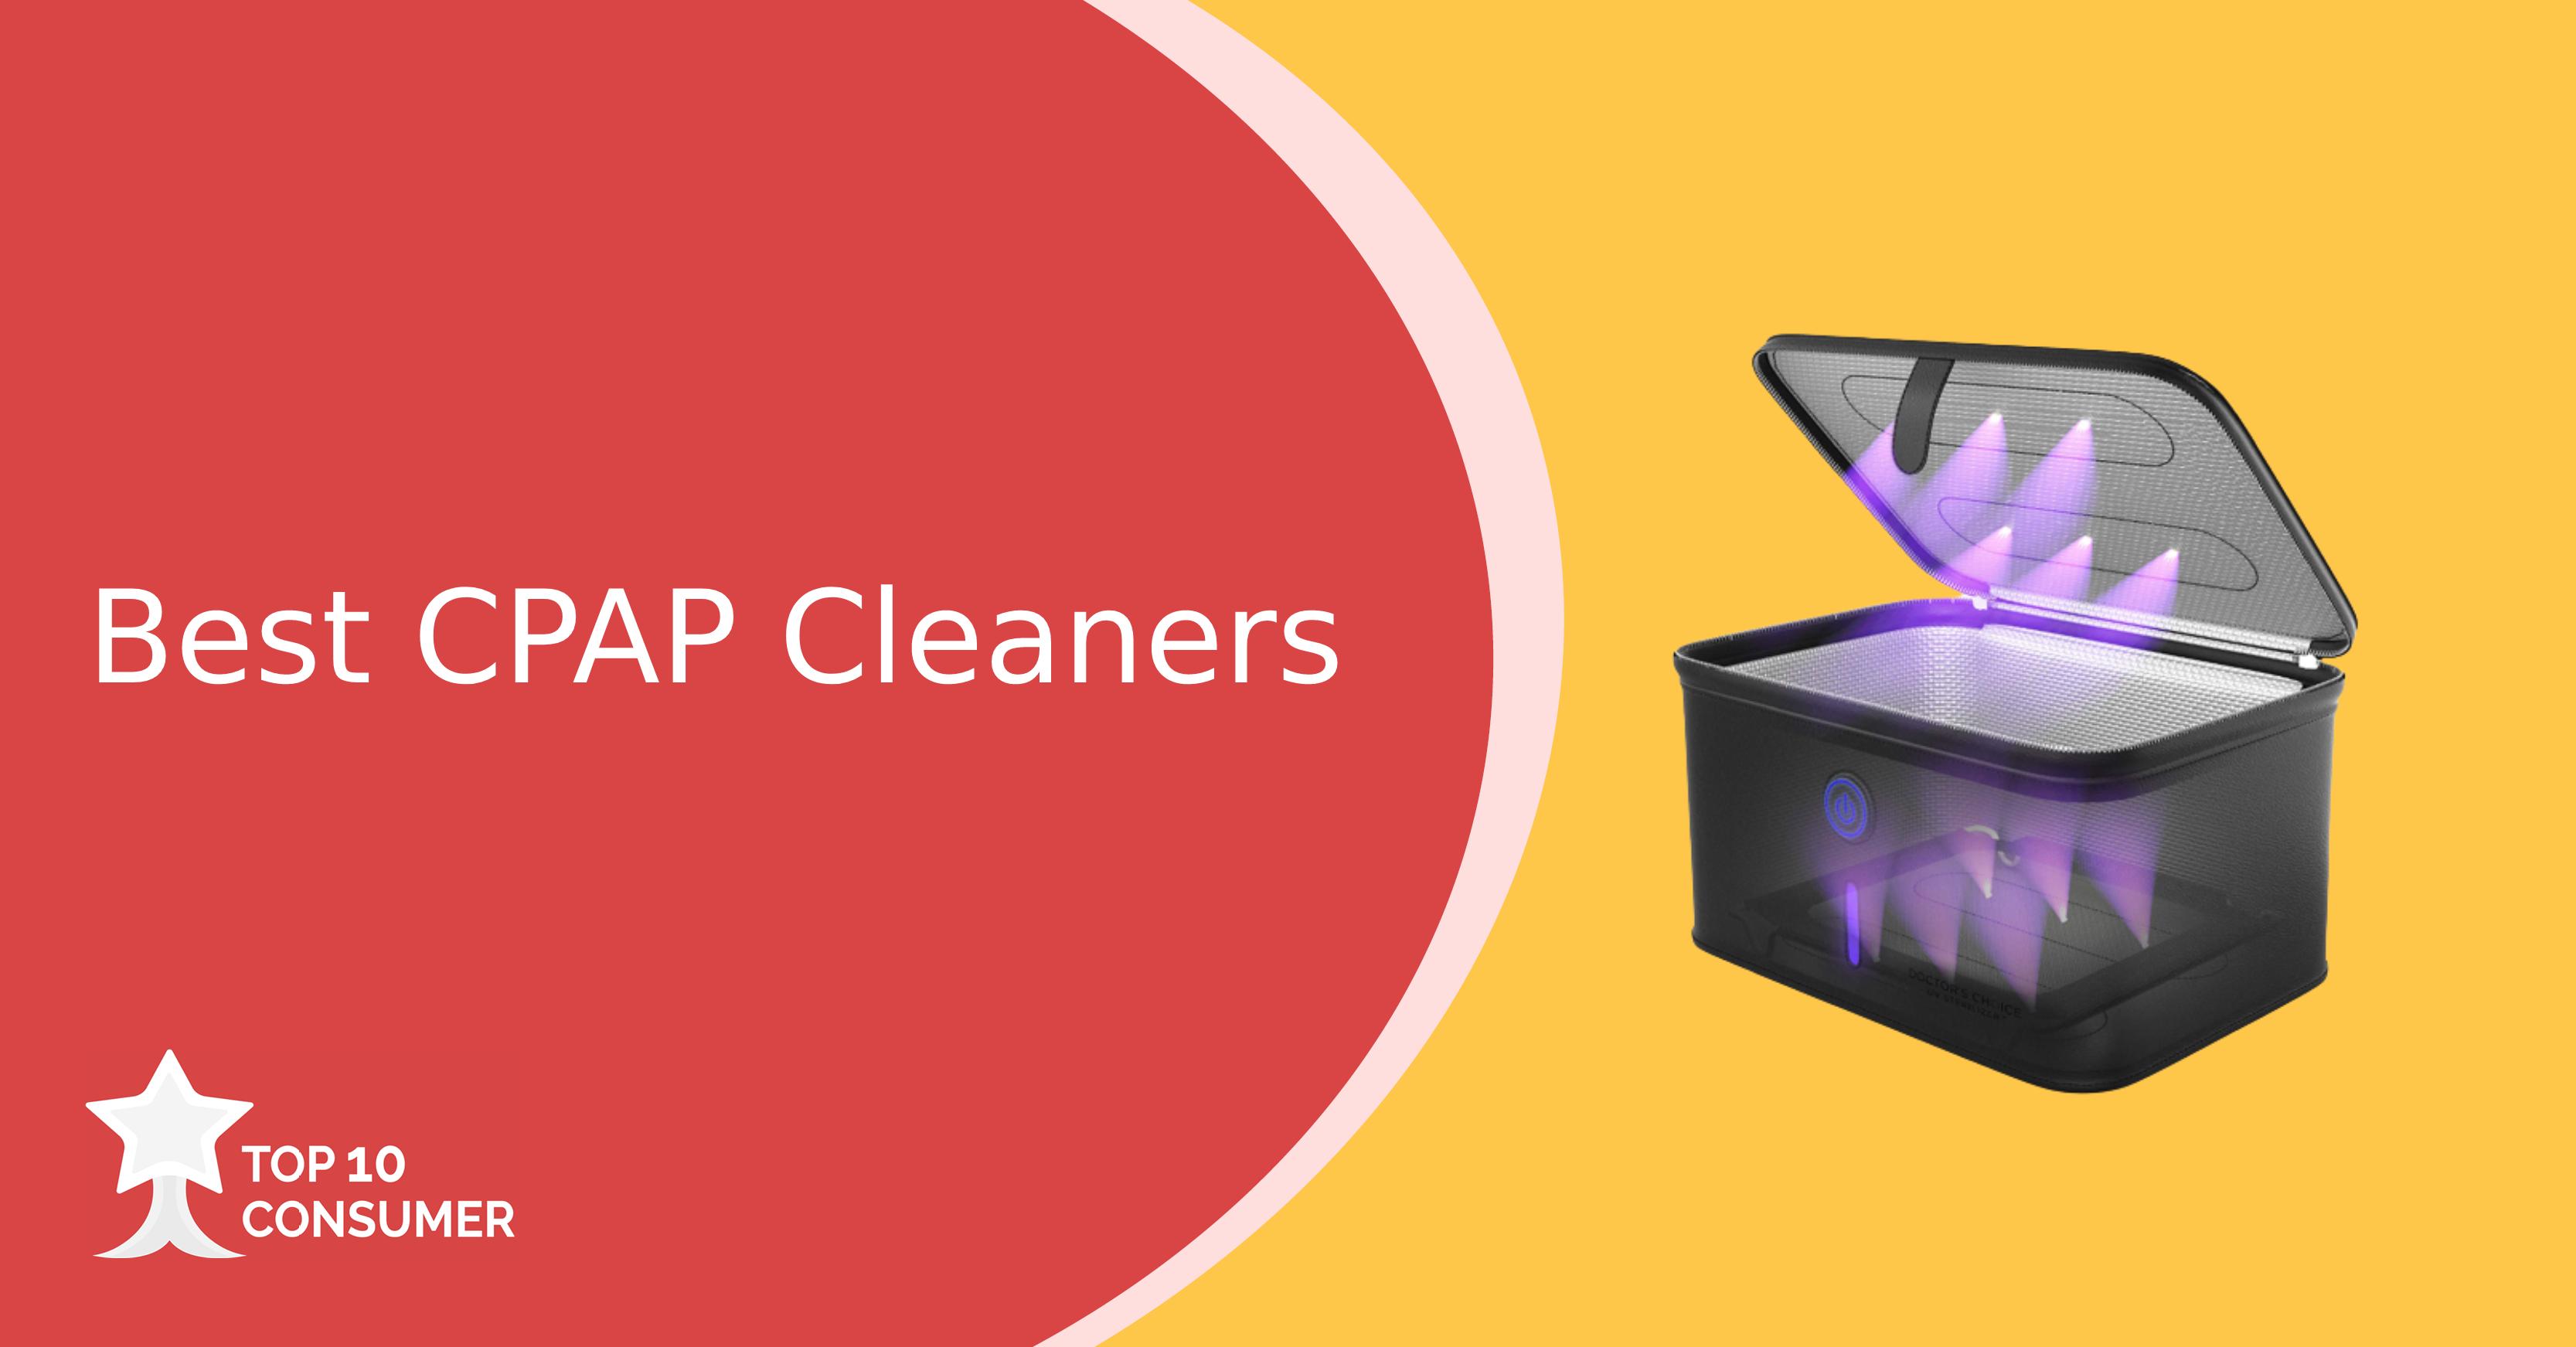 Best CPAP Cleaner